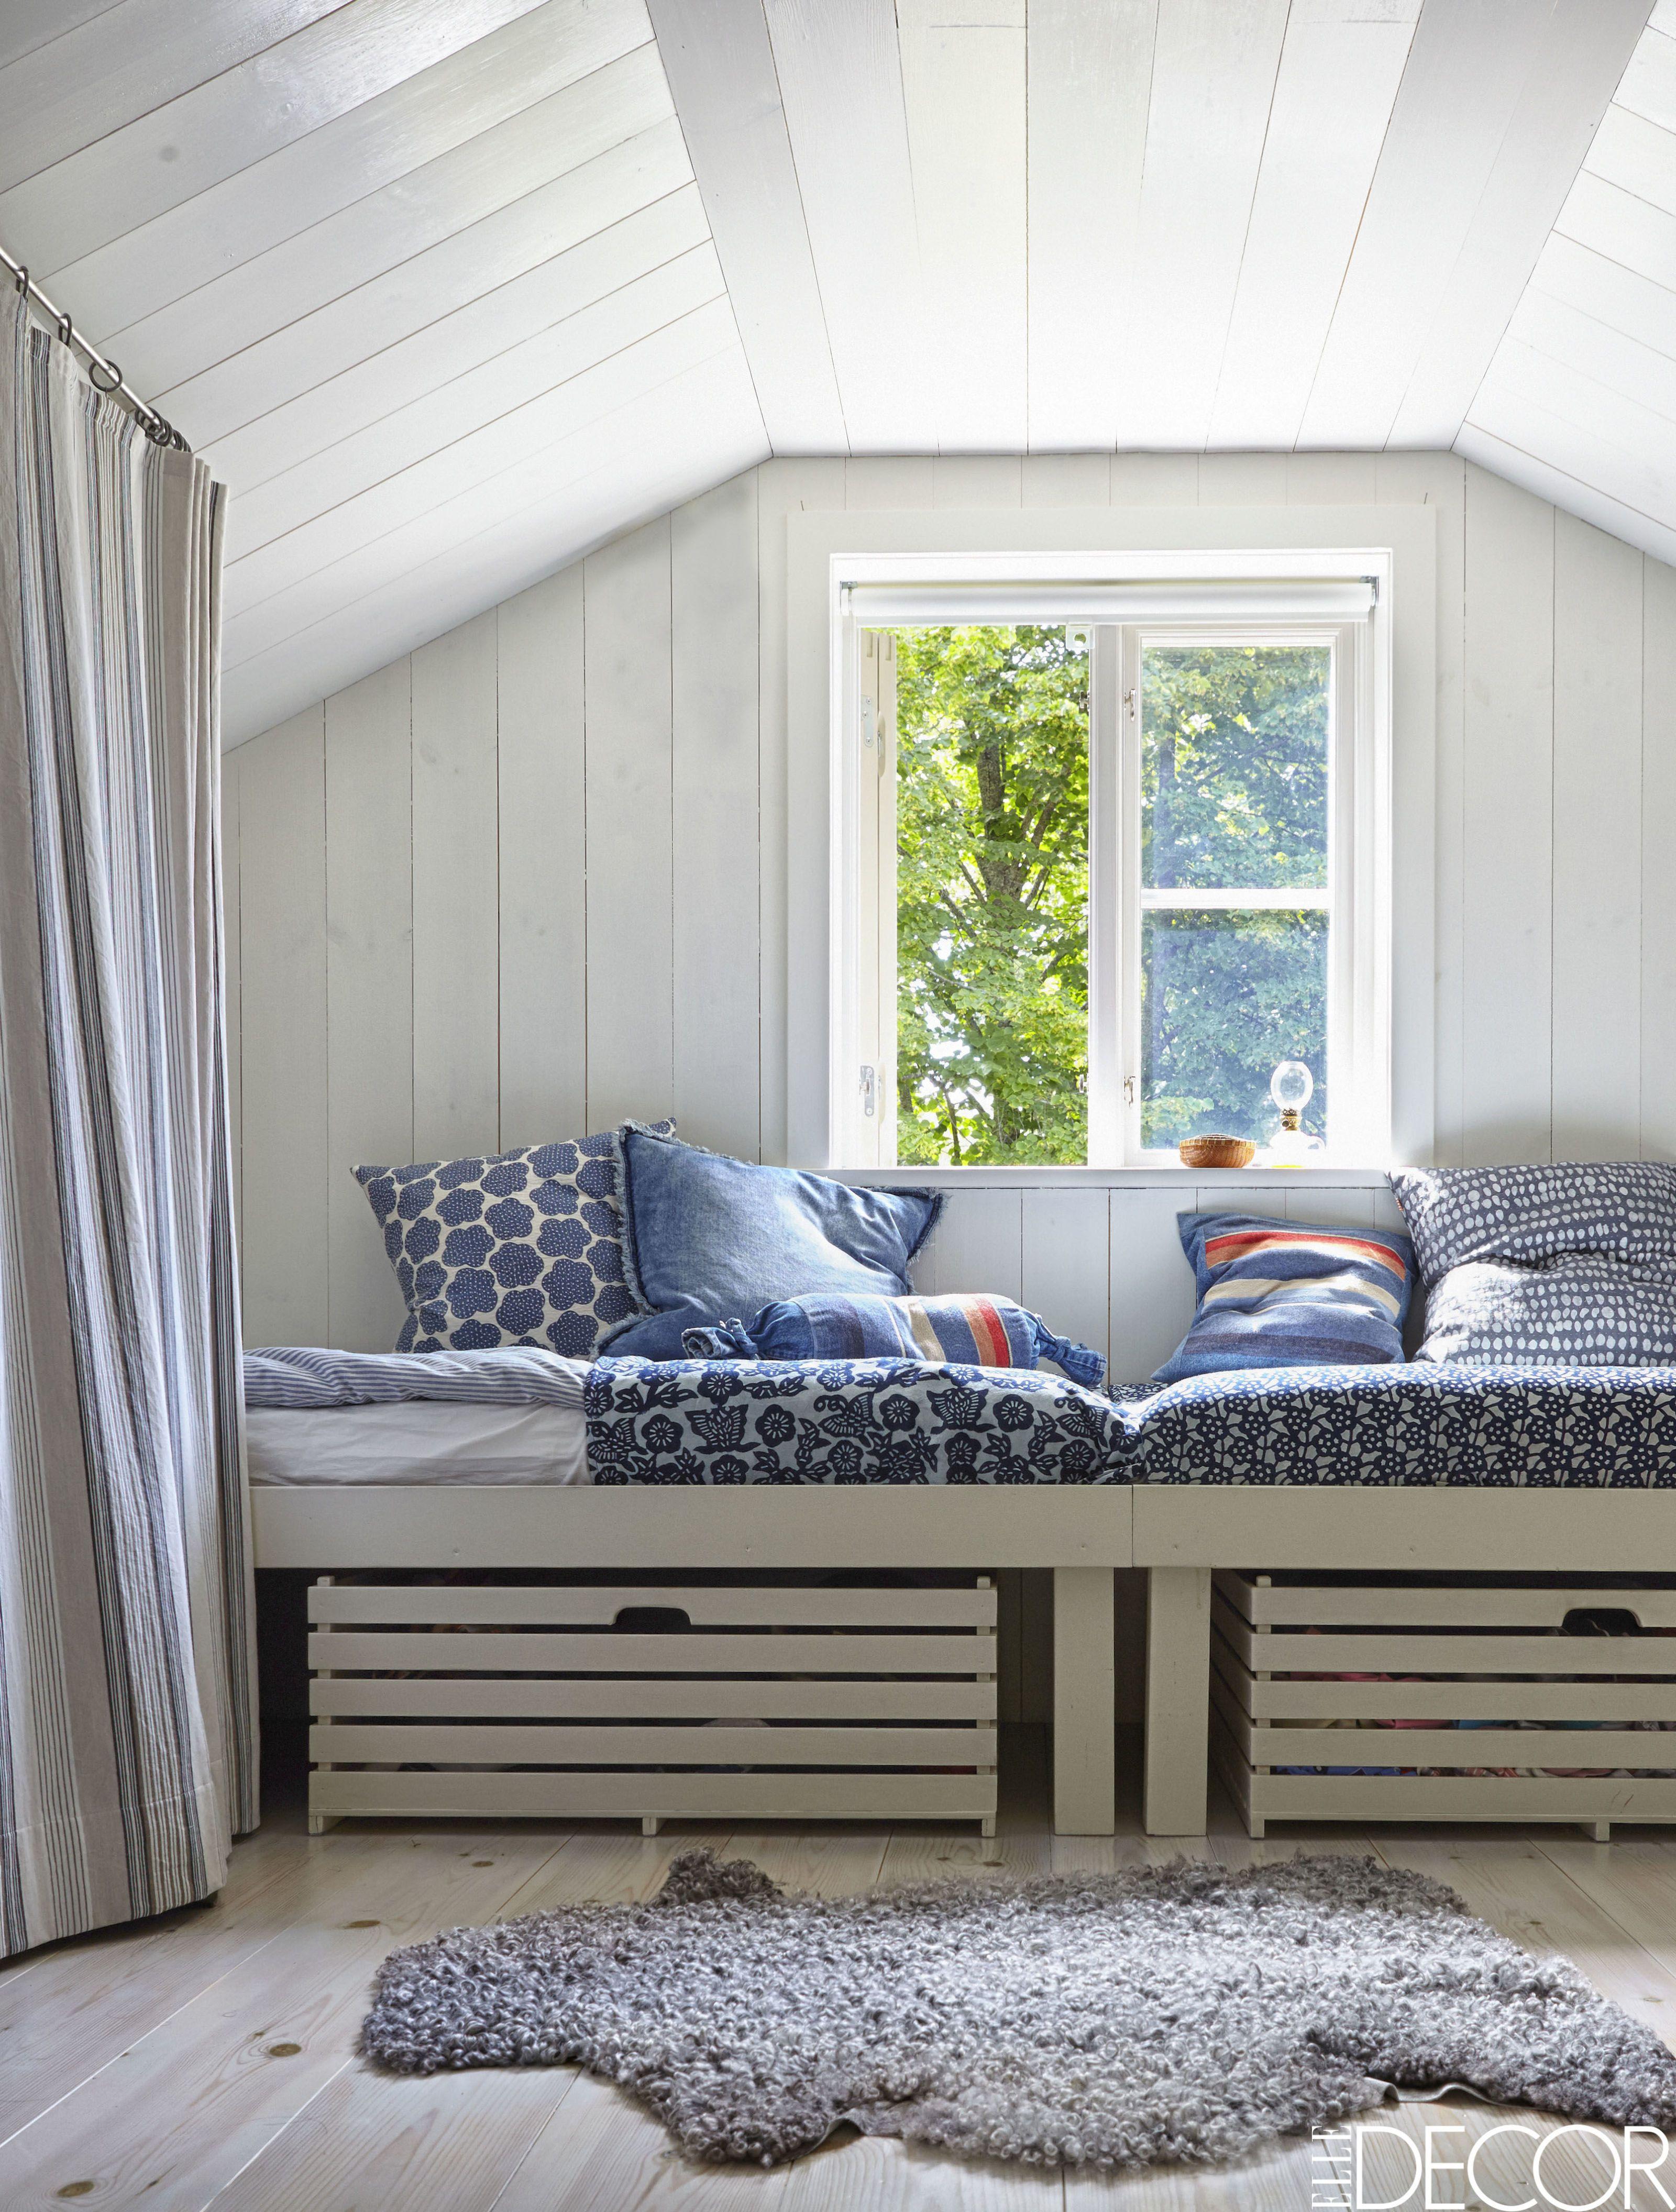 Tour A Minimalist Cottage With Scandinavian Design